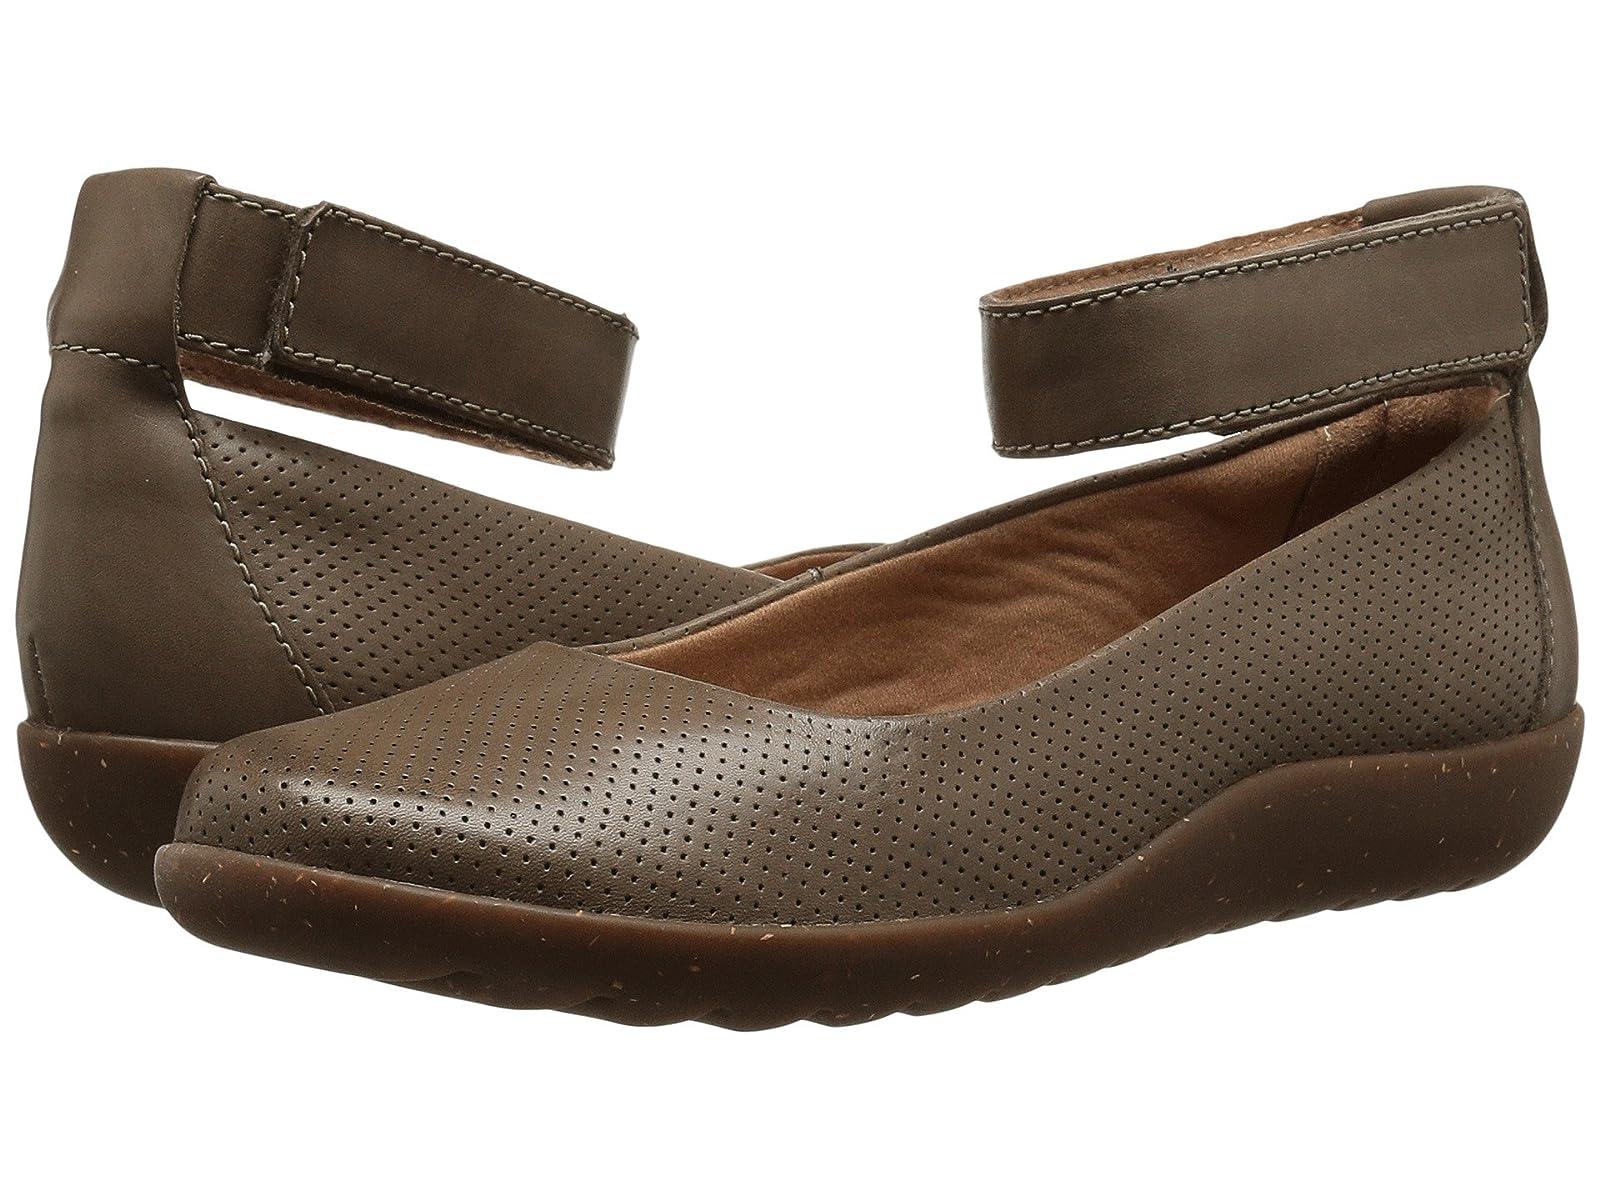 Clarks Medora NinaCheap and distinctive eye-catching shoes